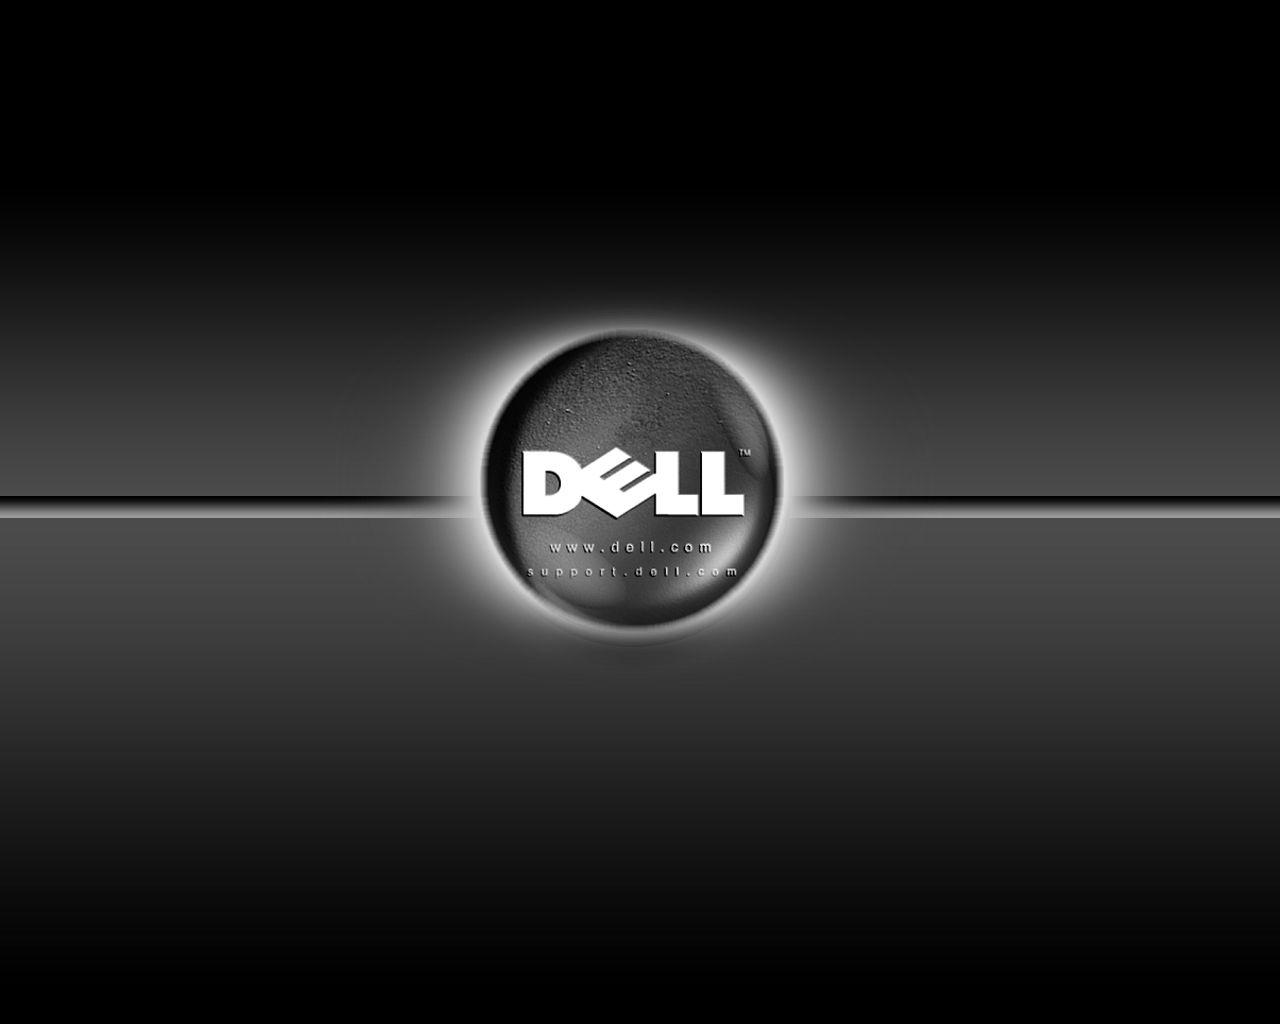 Dell Desktop Backgrounds Wallpaper in 2019 Laptop wallpaper 1280x1024